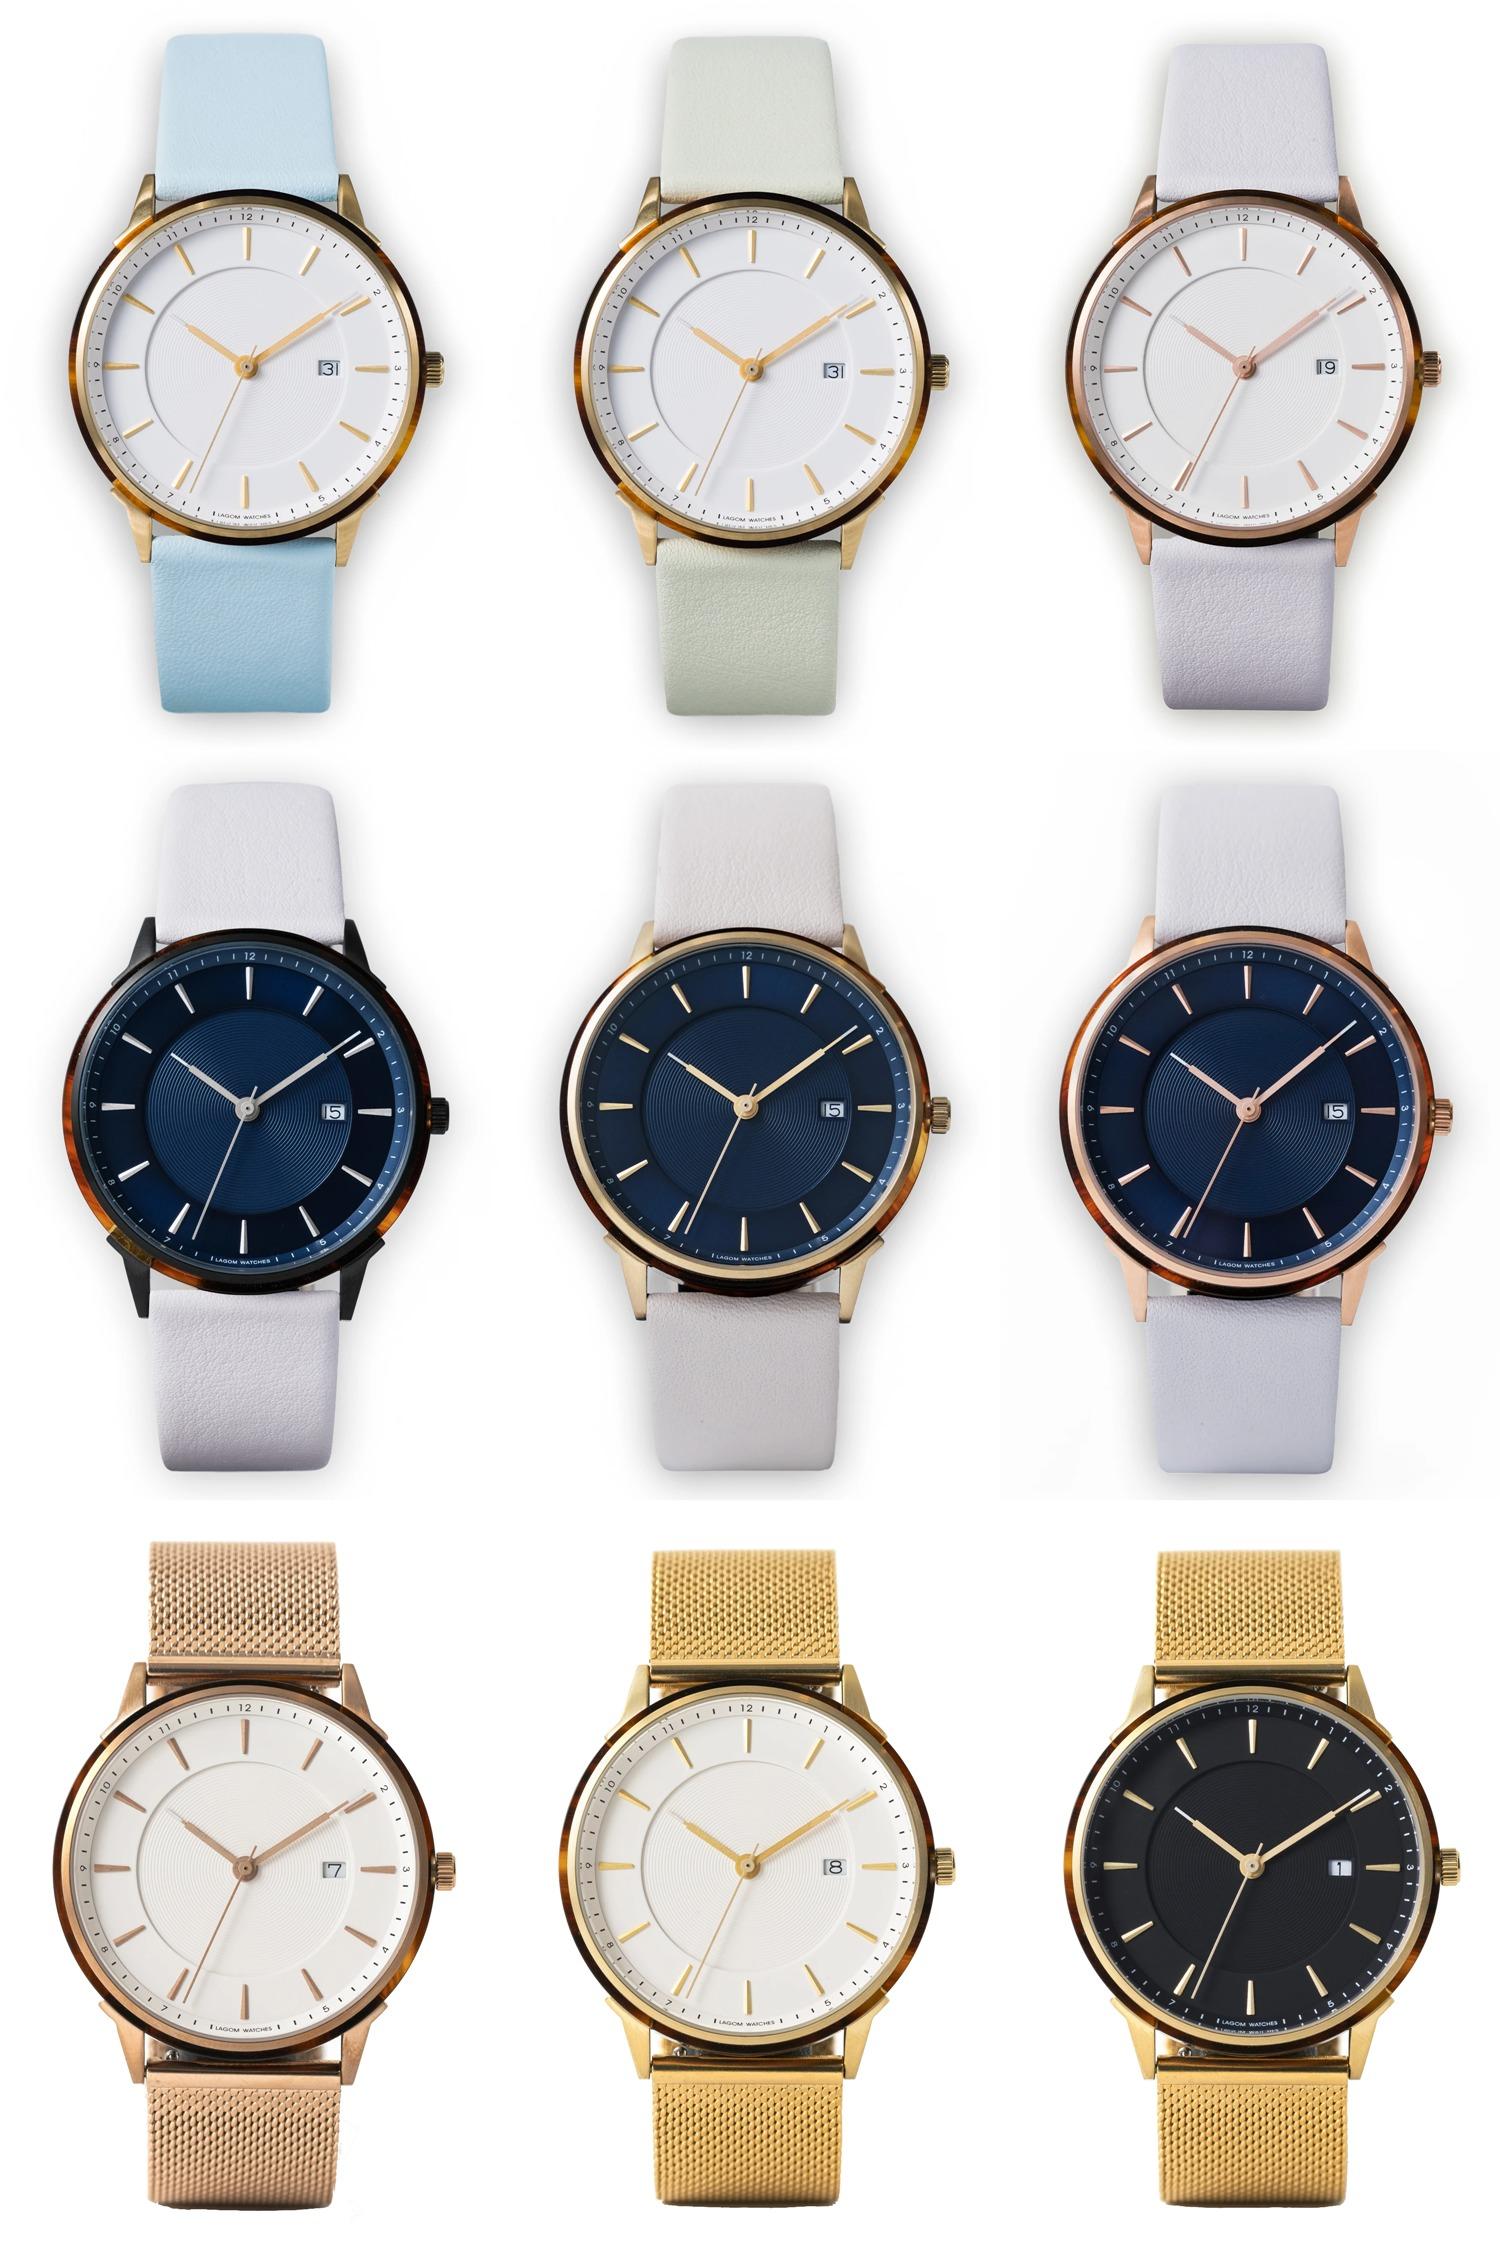 Lagom Watches(ラーゴムウォッチ)BORJA カラーバリエーション メッシュ ストラップ